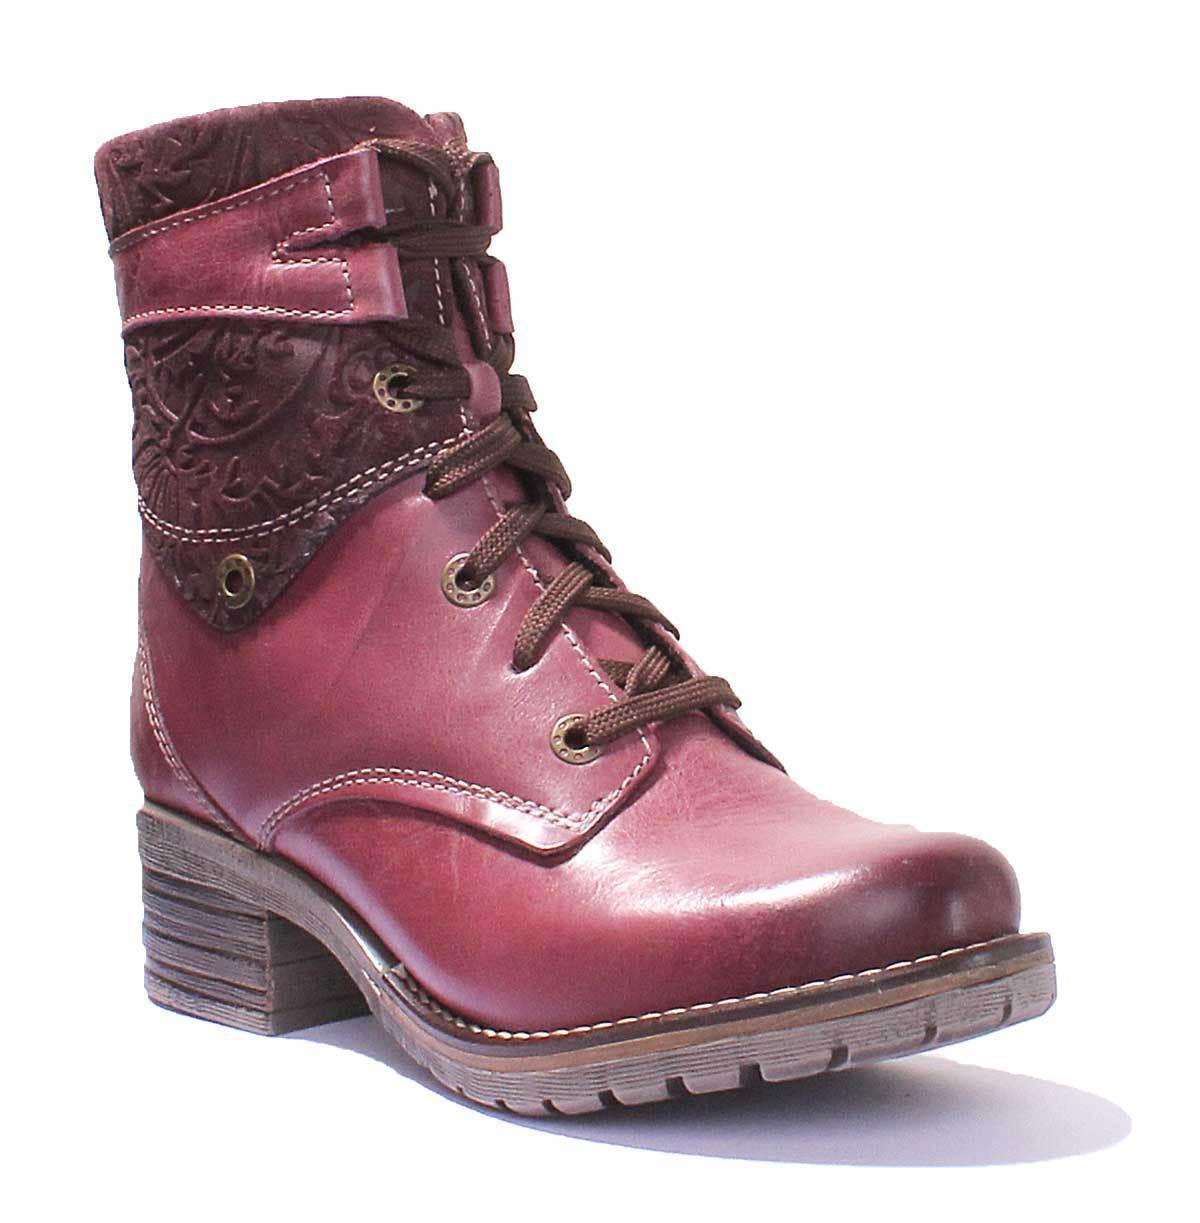 Dromedaris Kara Print Womens purple Waxy Creased Leather Boots UK Size 3 - 8